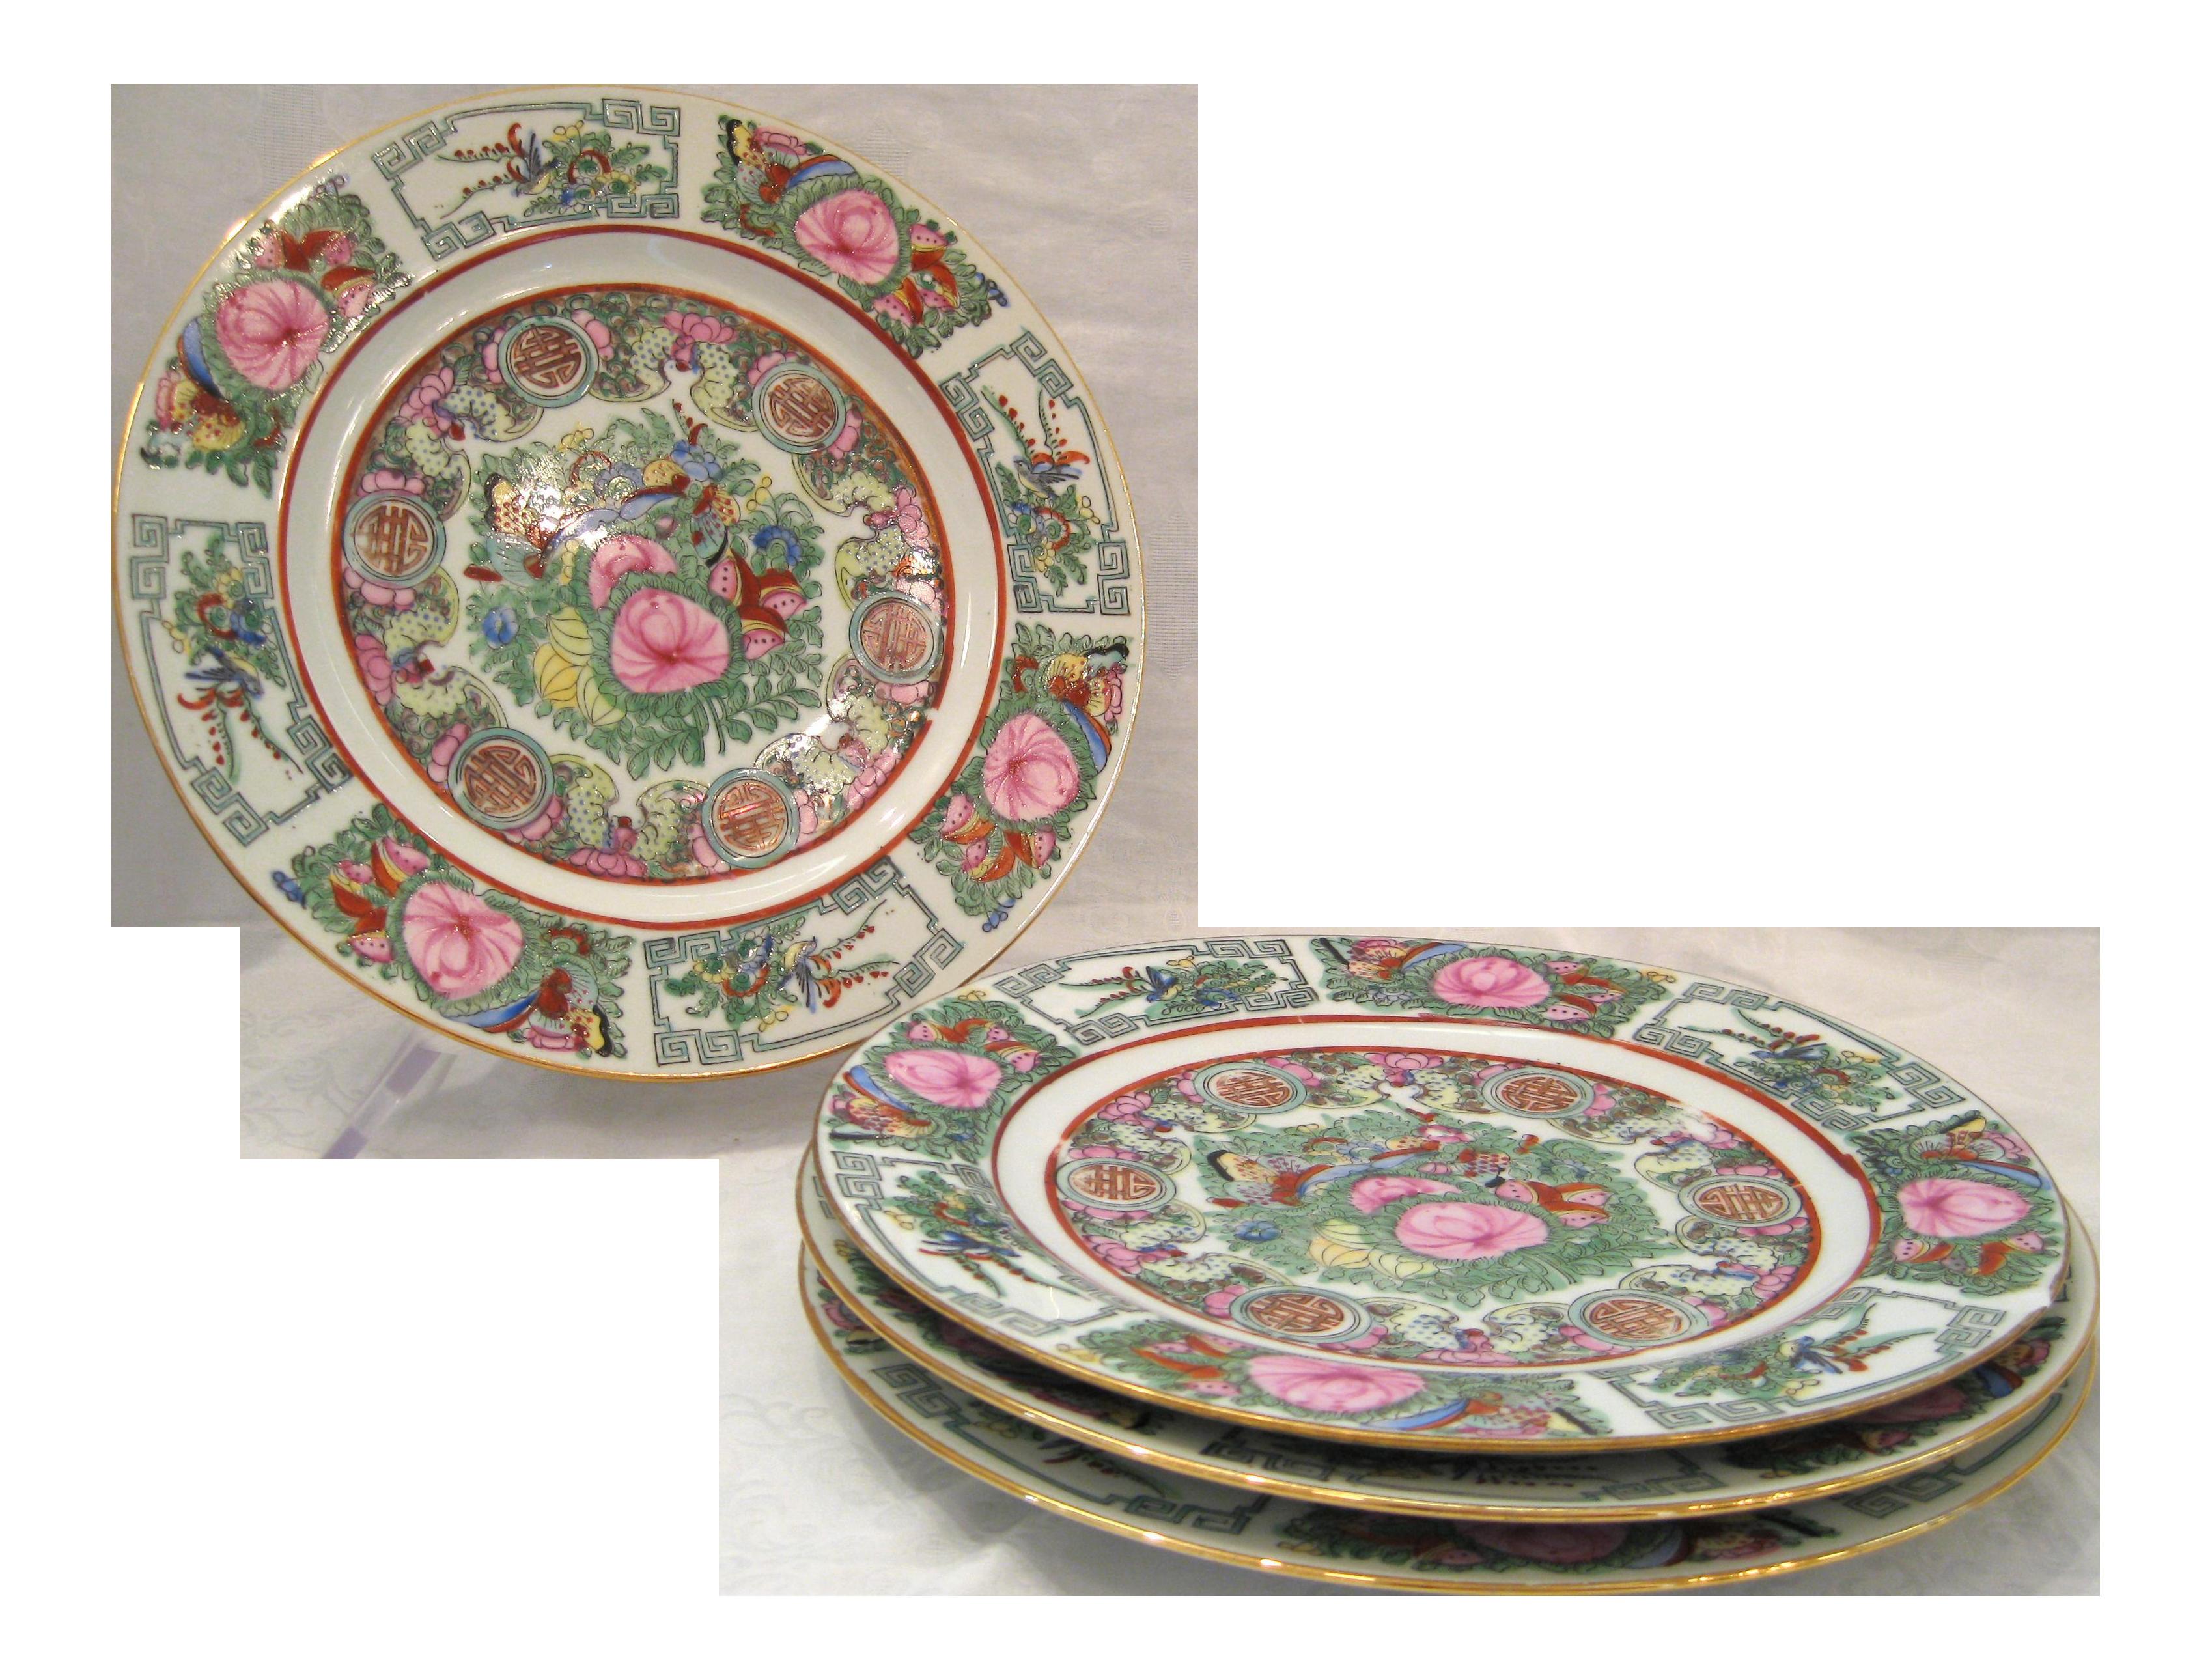 Vintage Rose Canton Porcelain Plates - Set of 4  sc 1 st  Chairish & Vintage Rose Canton Porcelain Plates - Set of 4 | Chairish